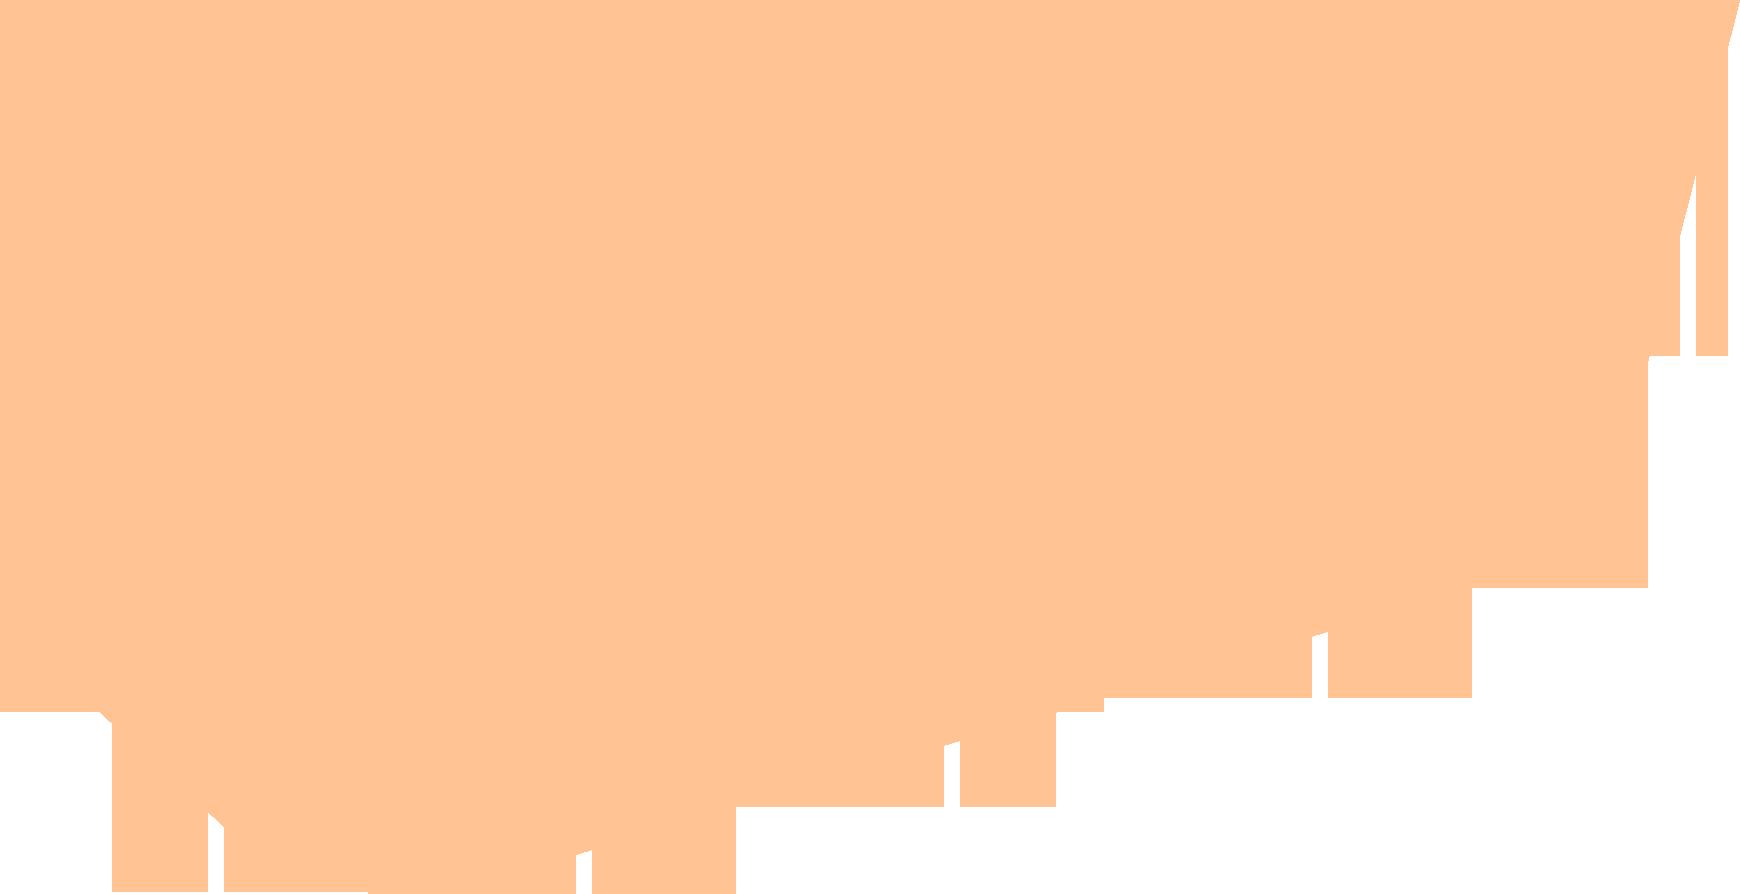 h13-rev-img-2.png